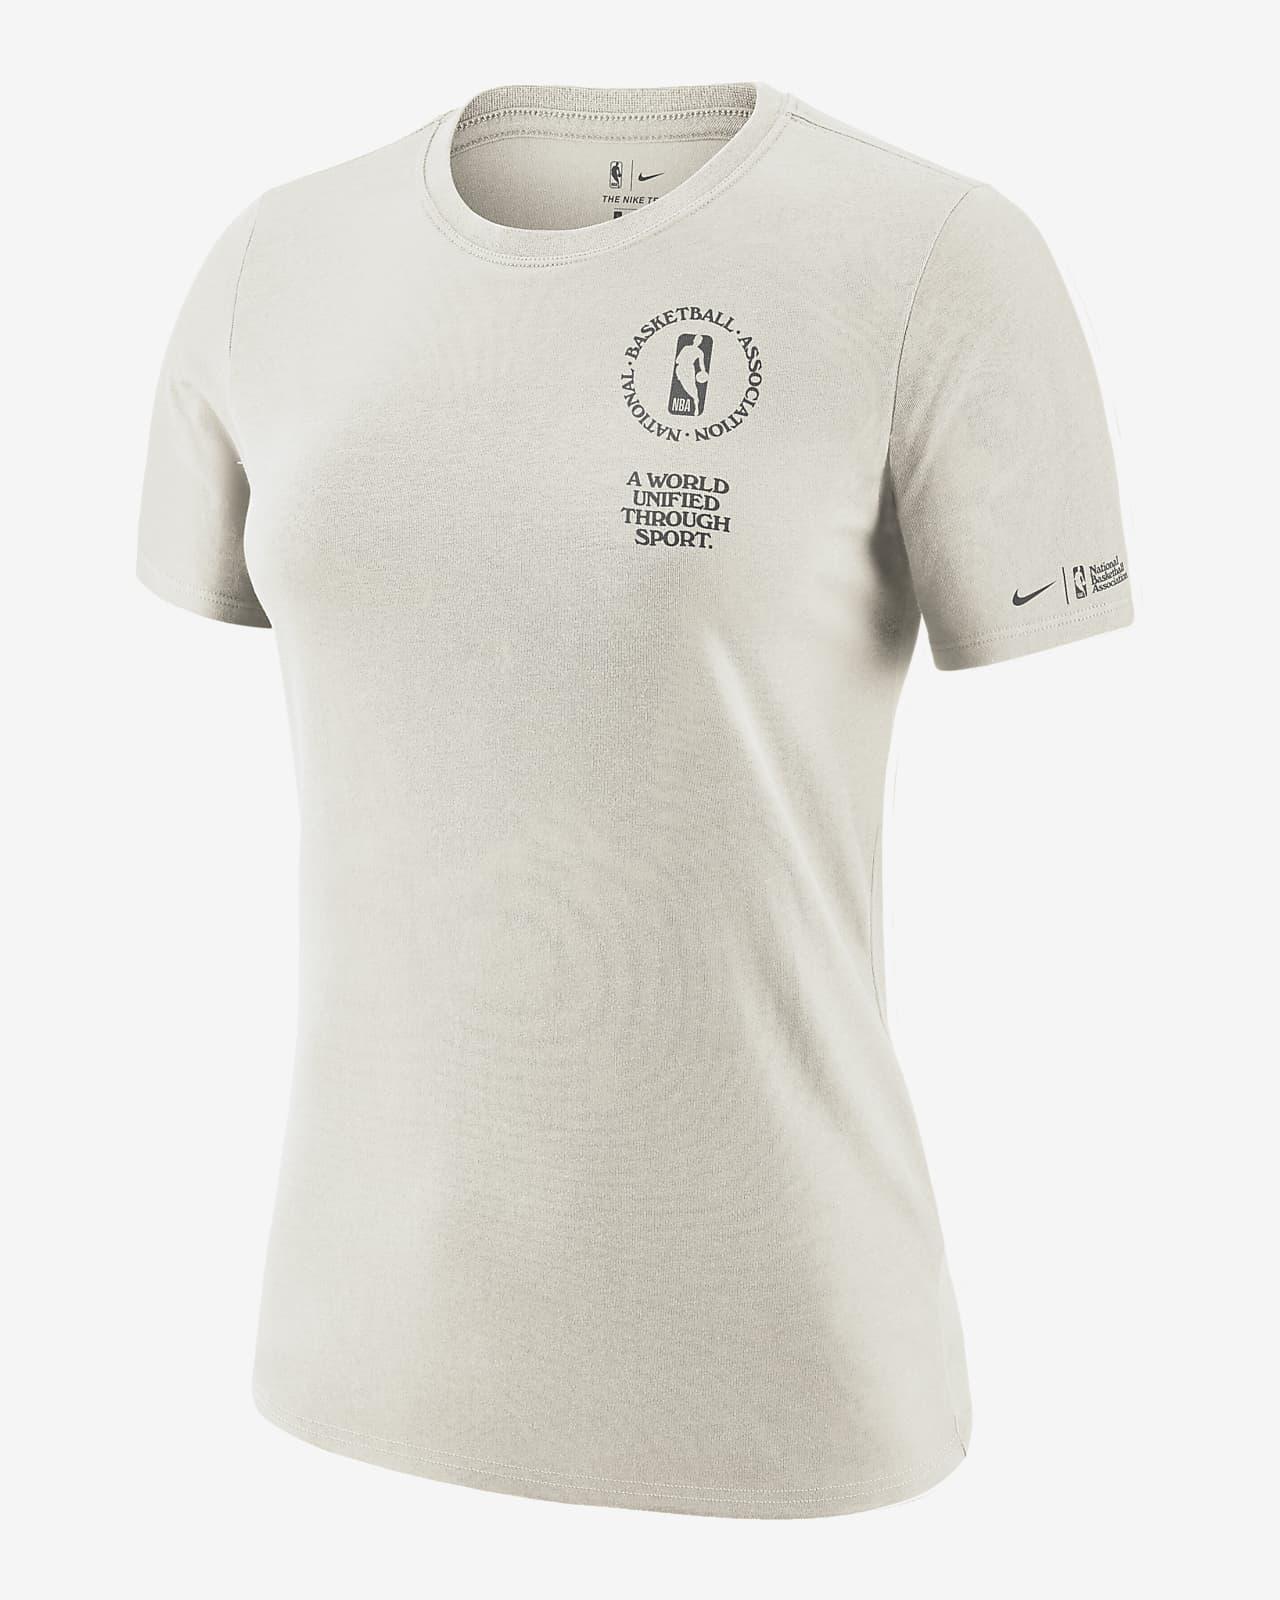 Team 31 Courtside Women's Nike NBA Short-Sleeve T-Shirt